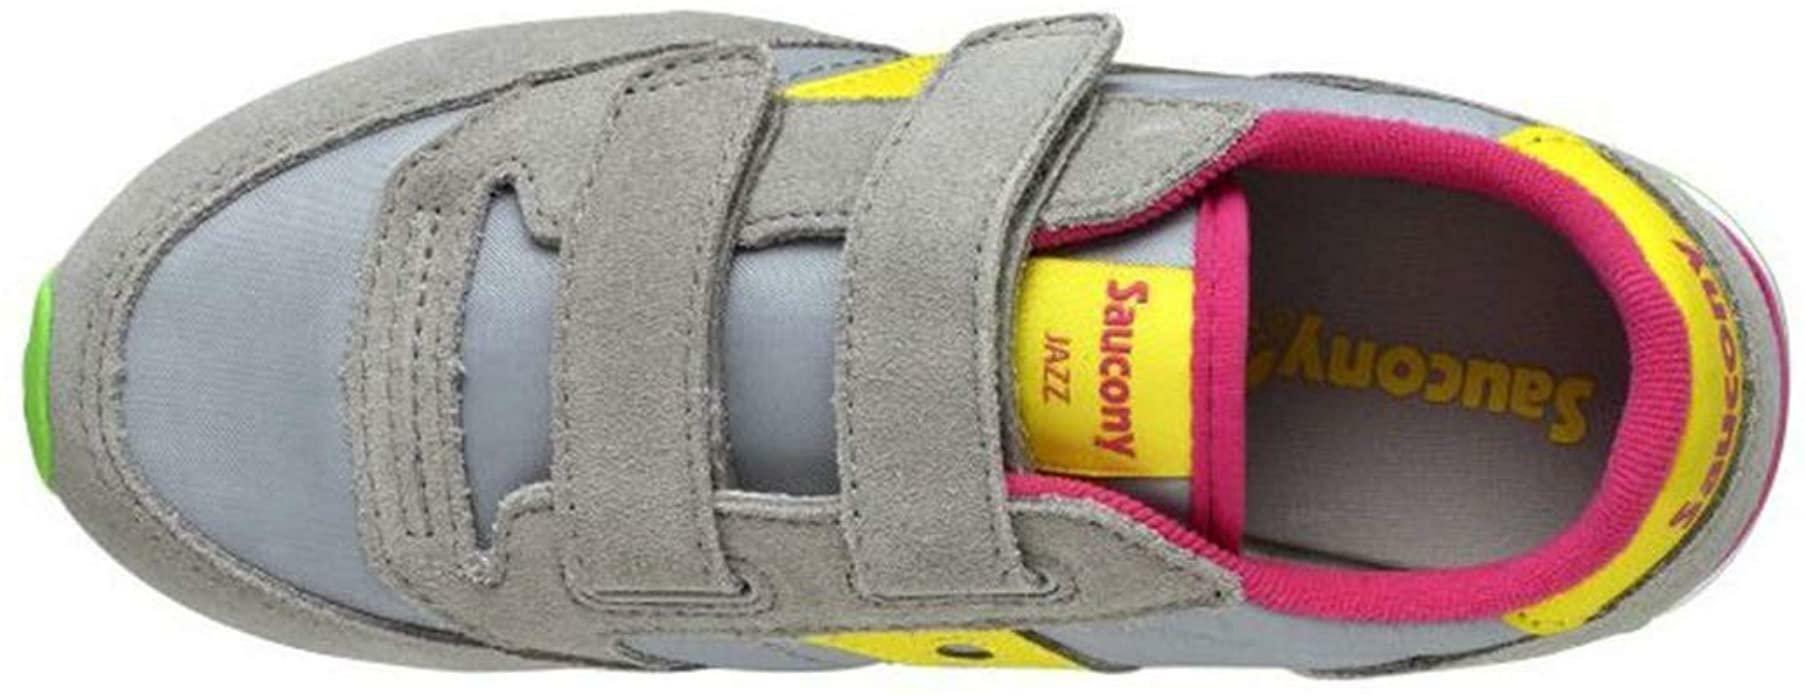 saucony saucony junior scarpa bambina grigio giallo sk159623